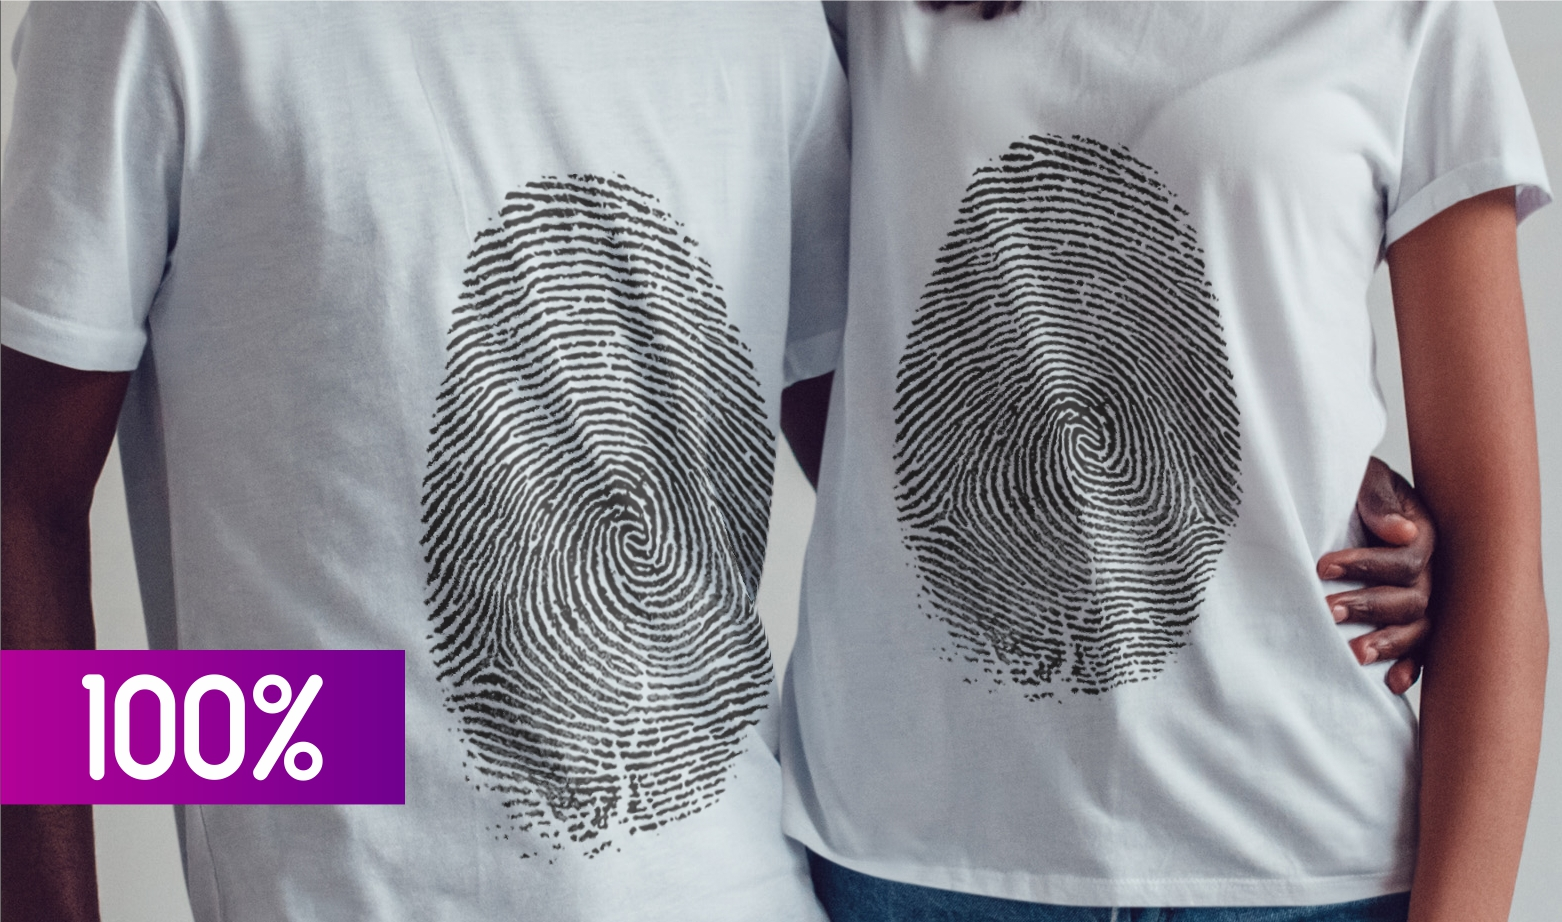 T-Shirt Mock-Up 2018 #1 example image 17